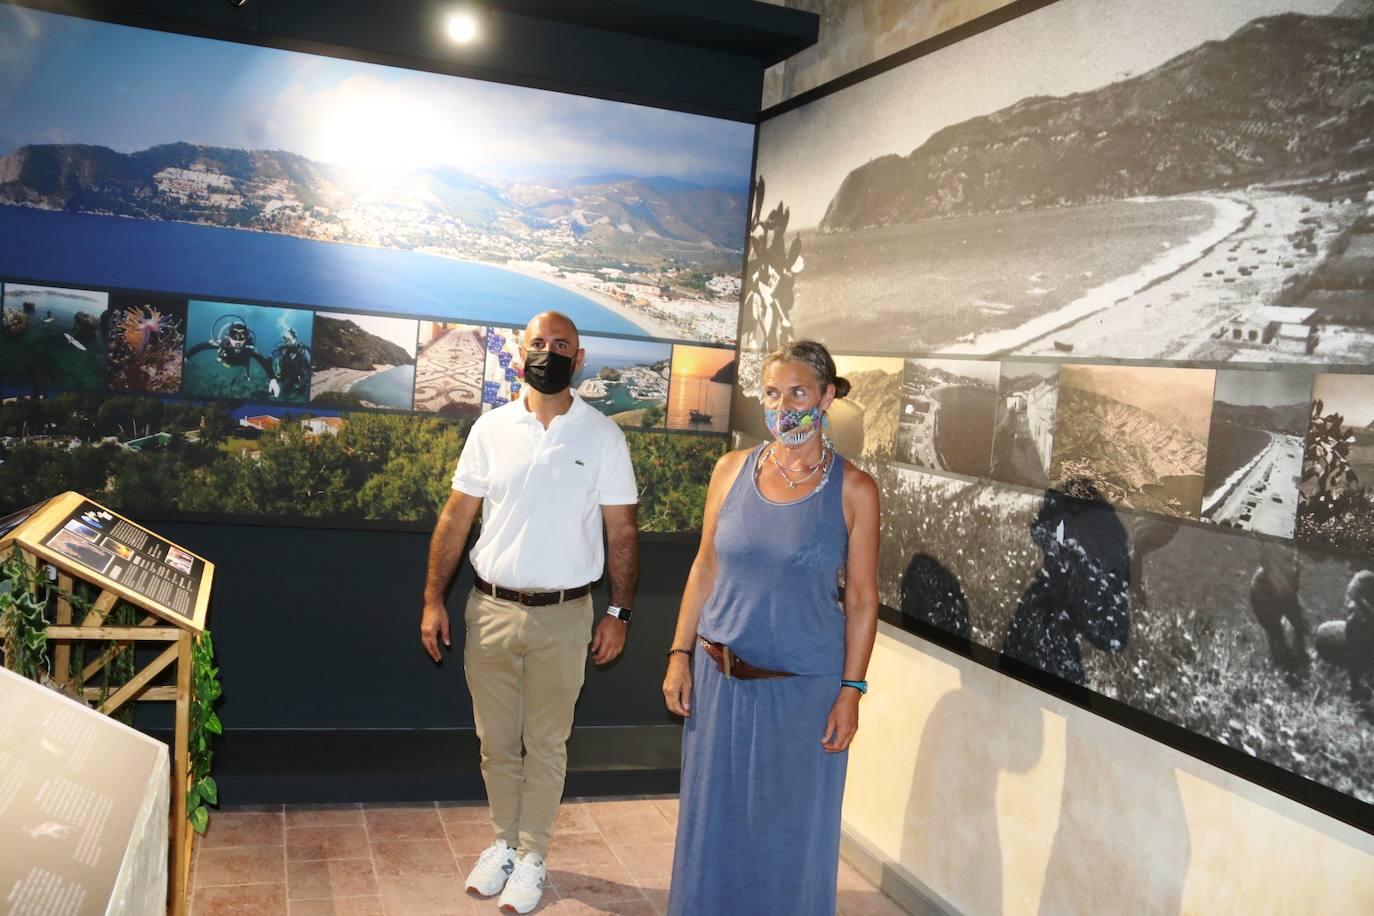 La Herradura castle offers a permanent home for new marine life exhibition